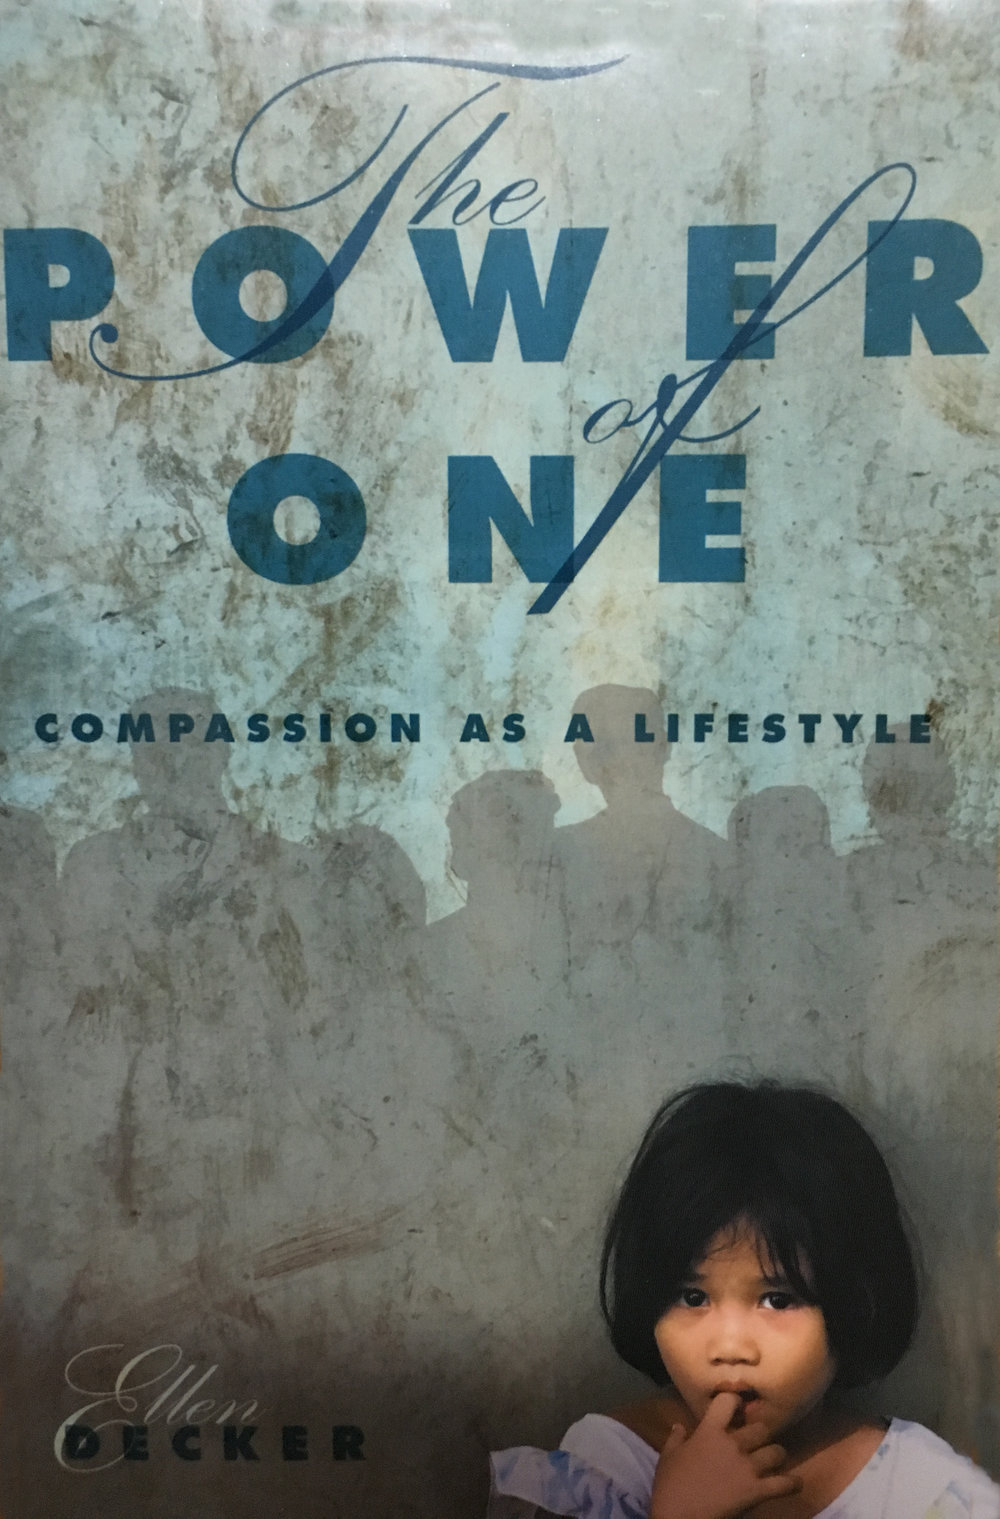 Power of One book cover Decker.JPG